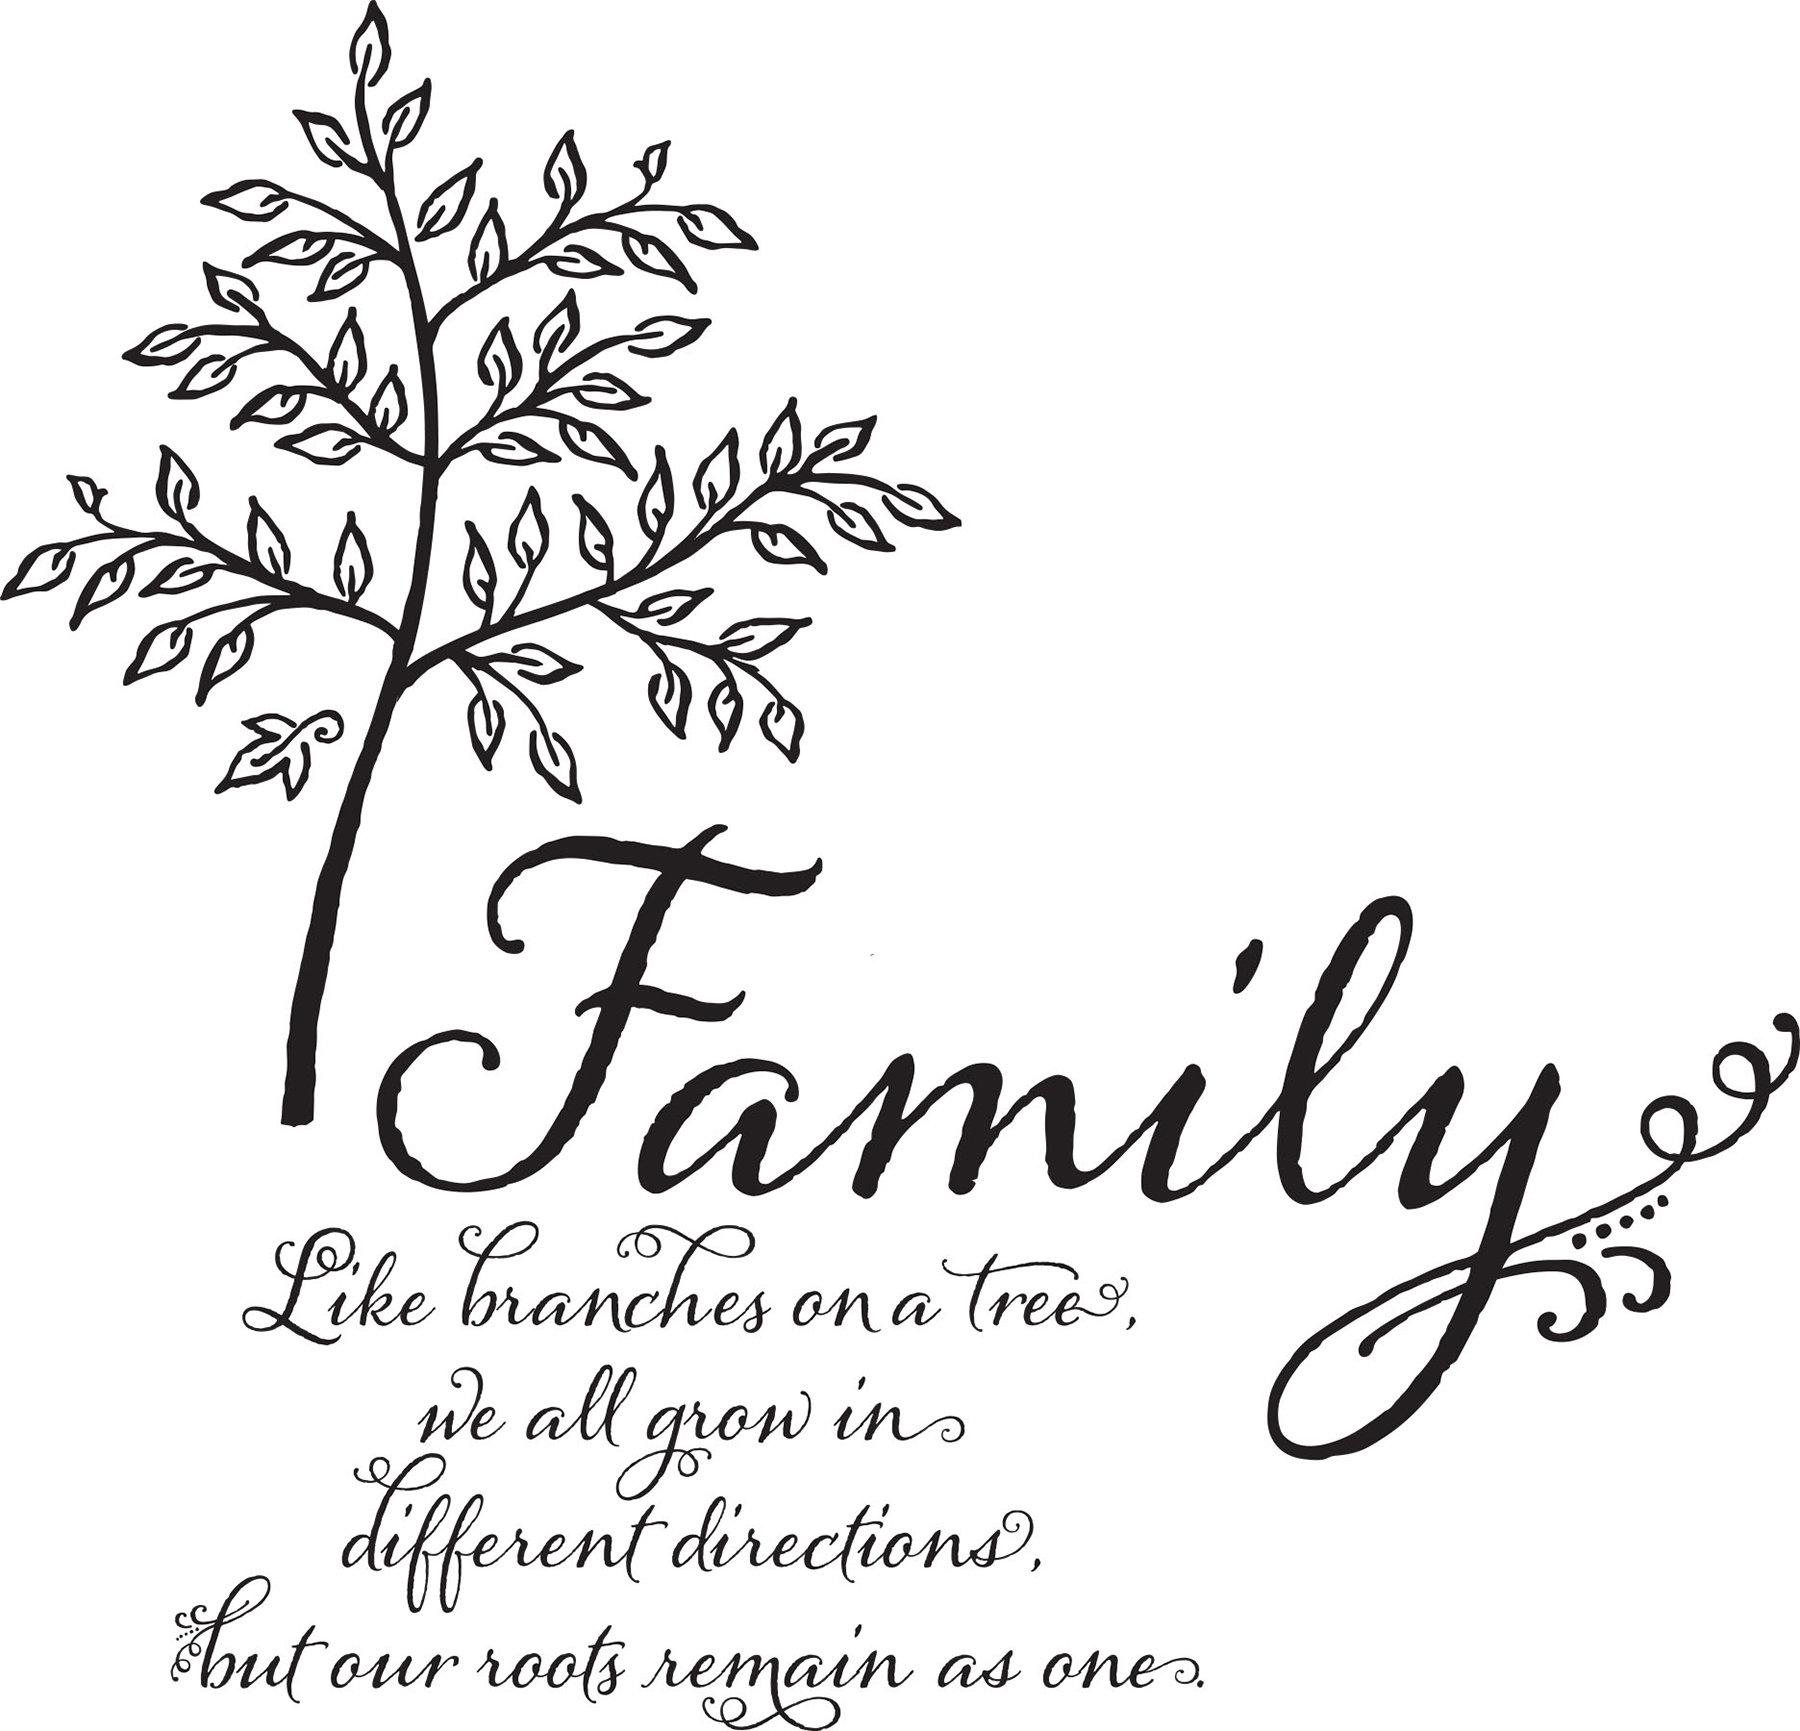 Winston Porter Droney Family Tree Quote Wall Decal Wayfairca